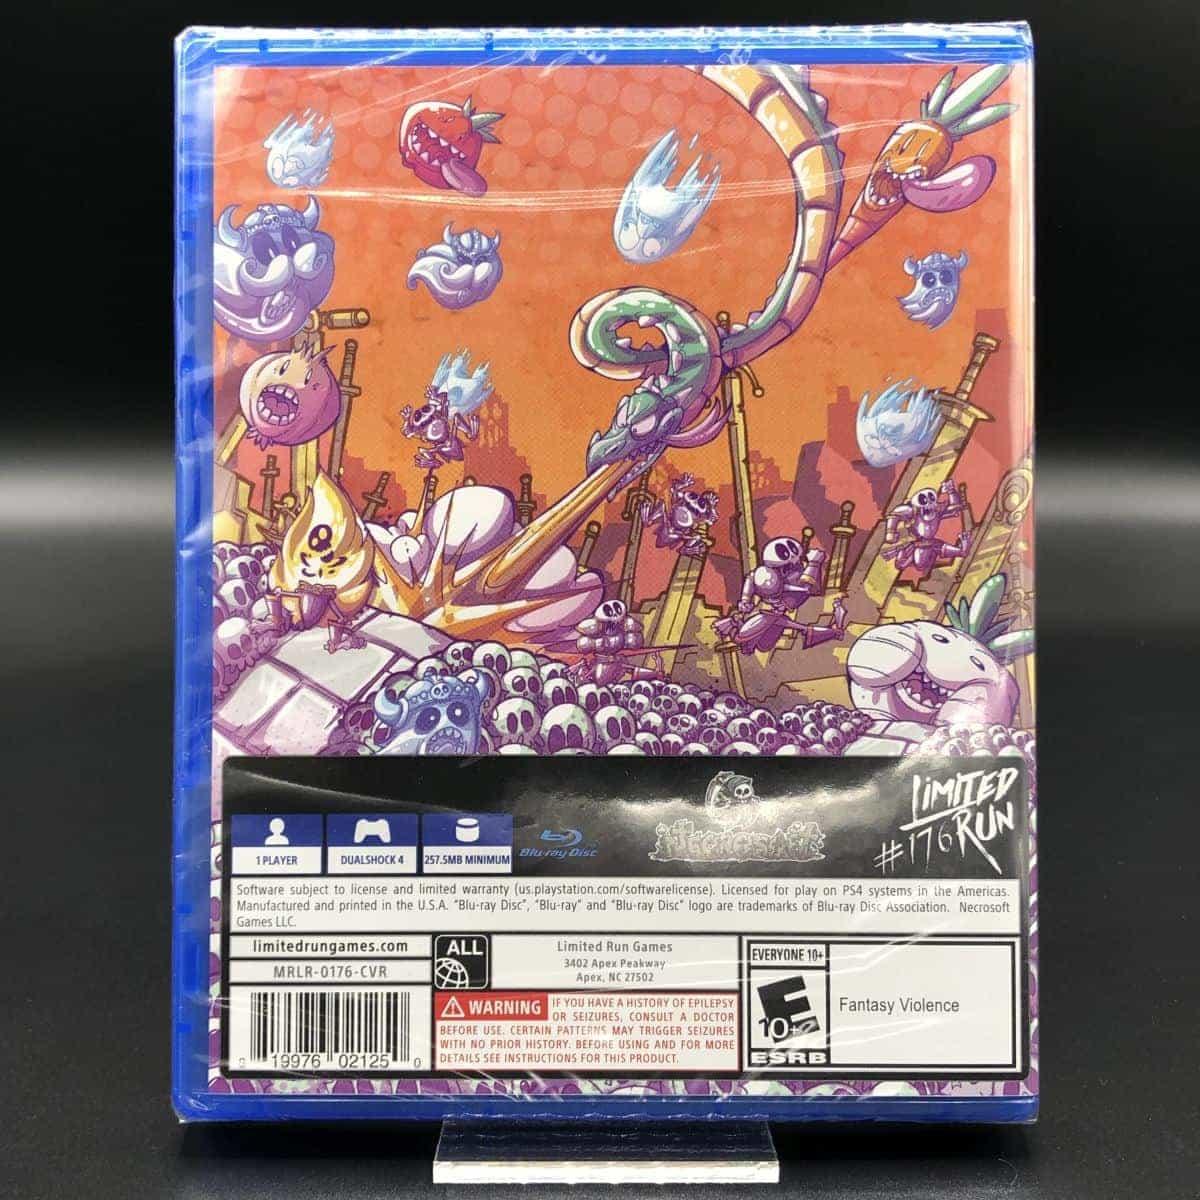 PS4 GunHouse - Limited Run #176 (Import) (NEU) Sony PlayStation 4